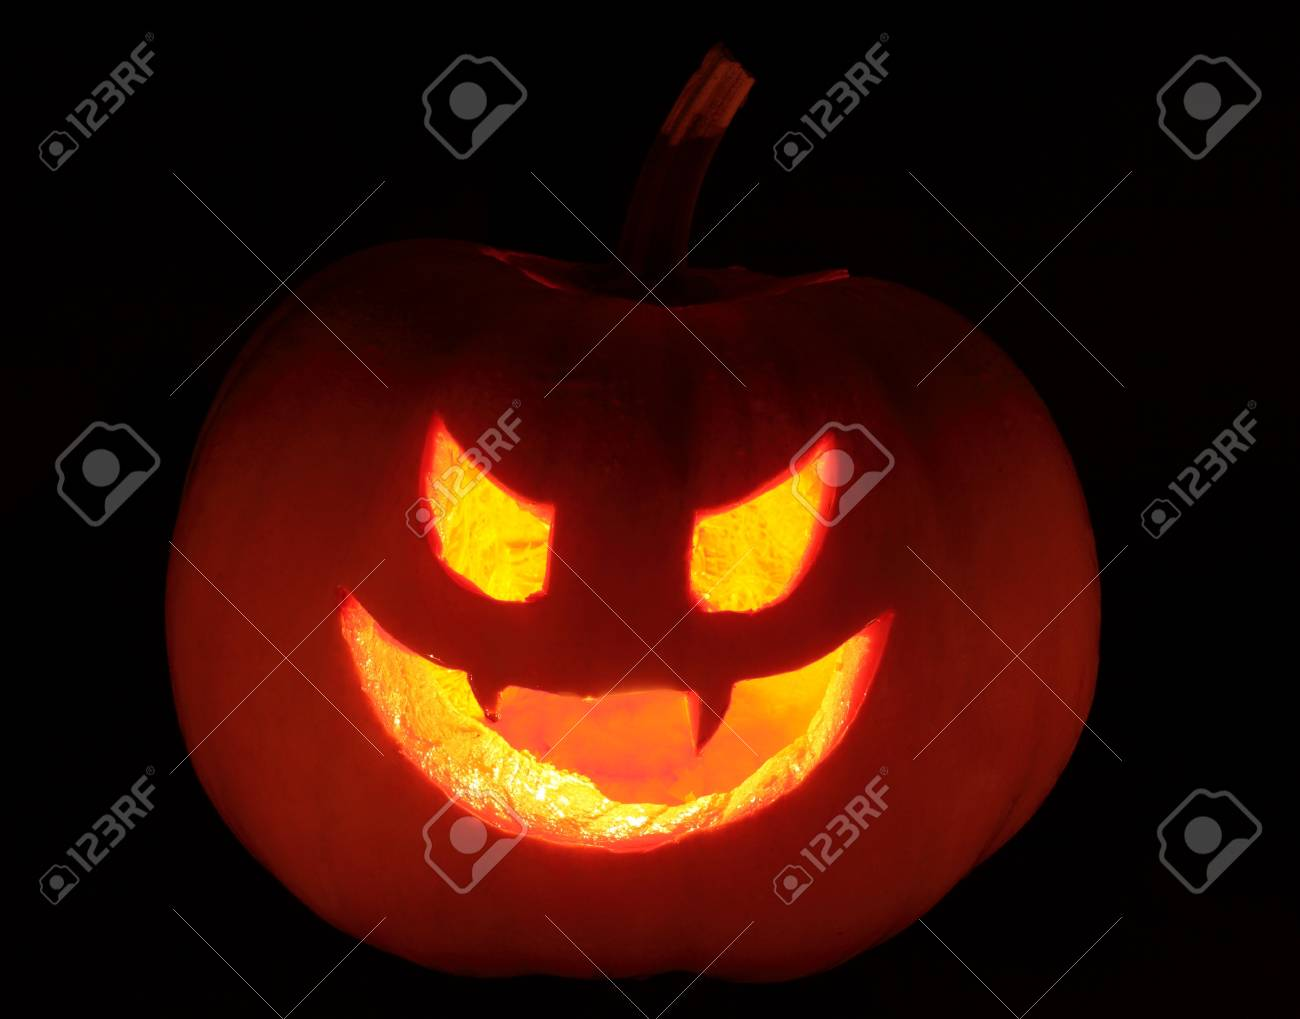 hallowen natural pumpkin with candles inside illuminating dark background Stock Photo - 16255636